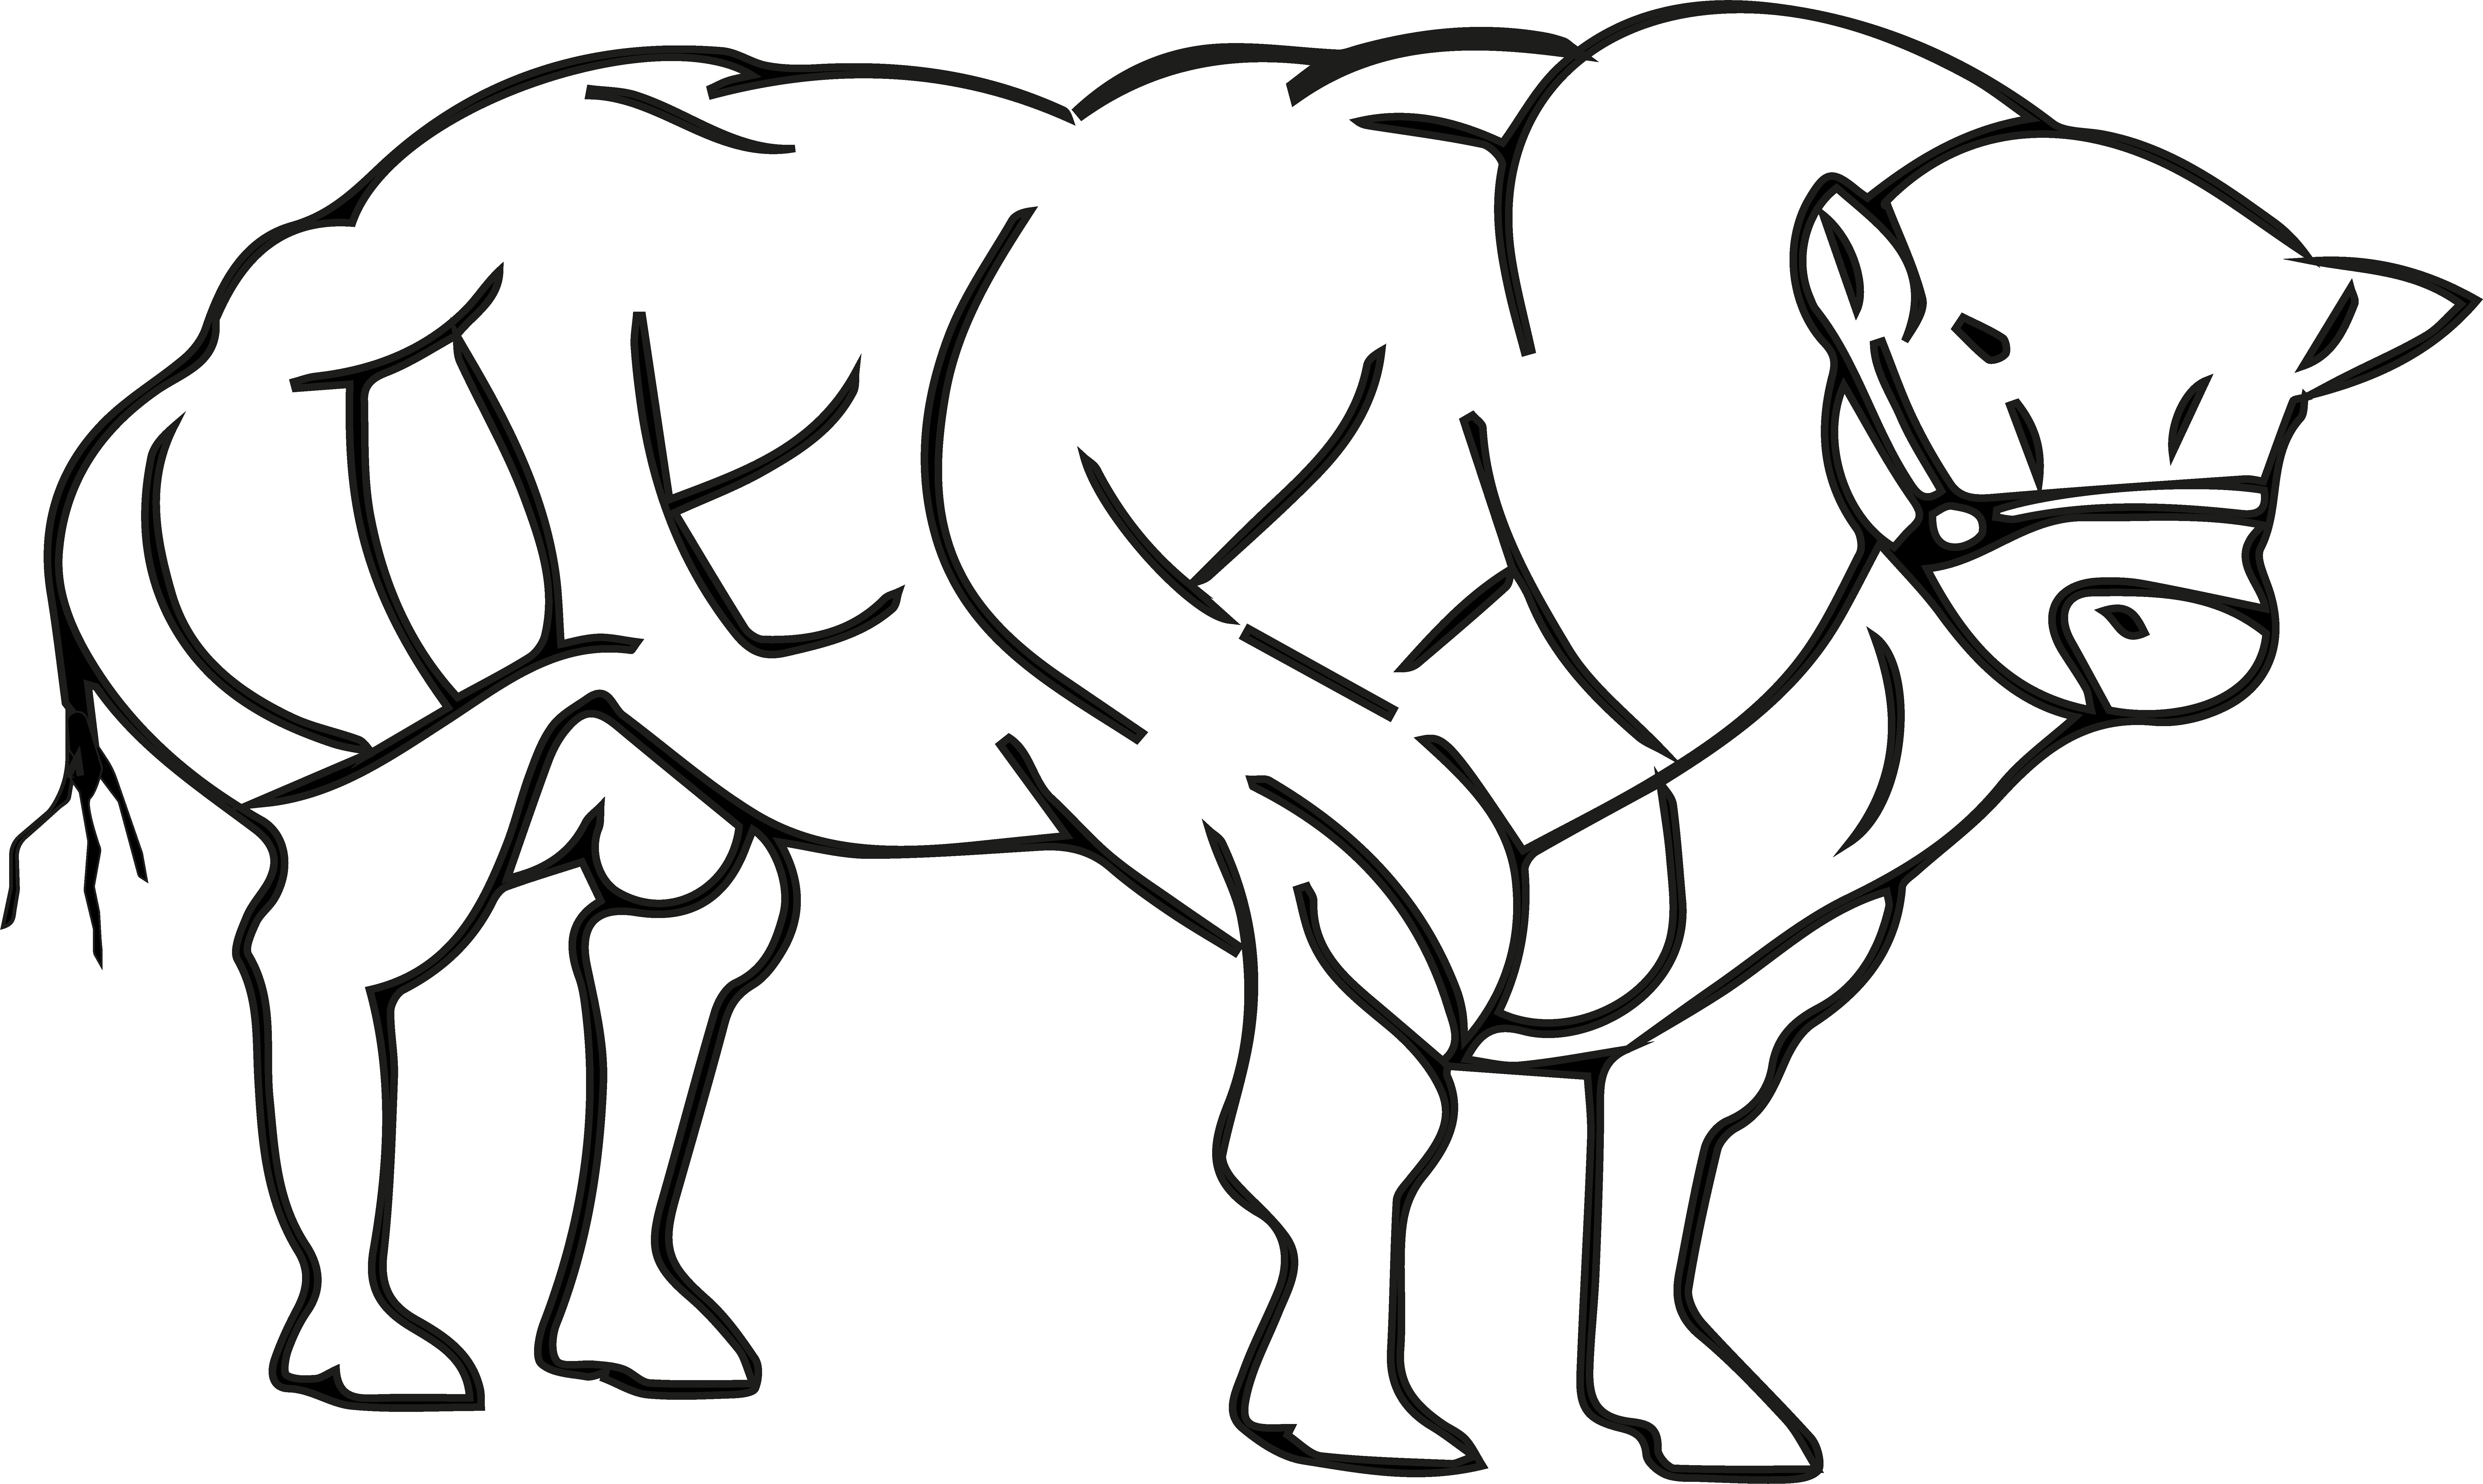 Vleesveehouderij Spronk